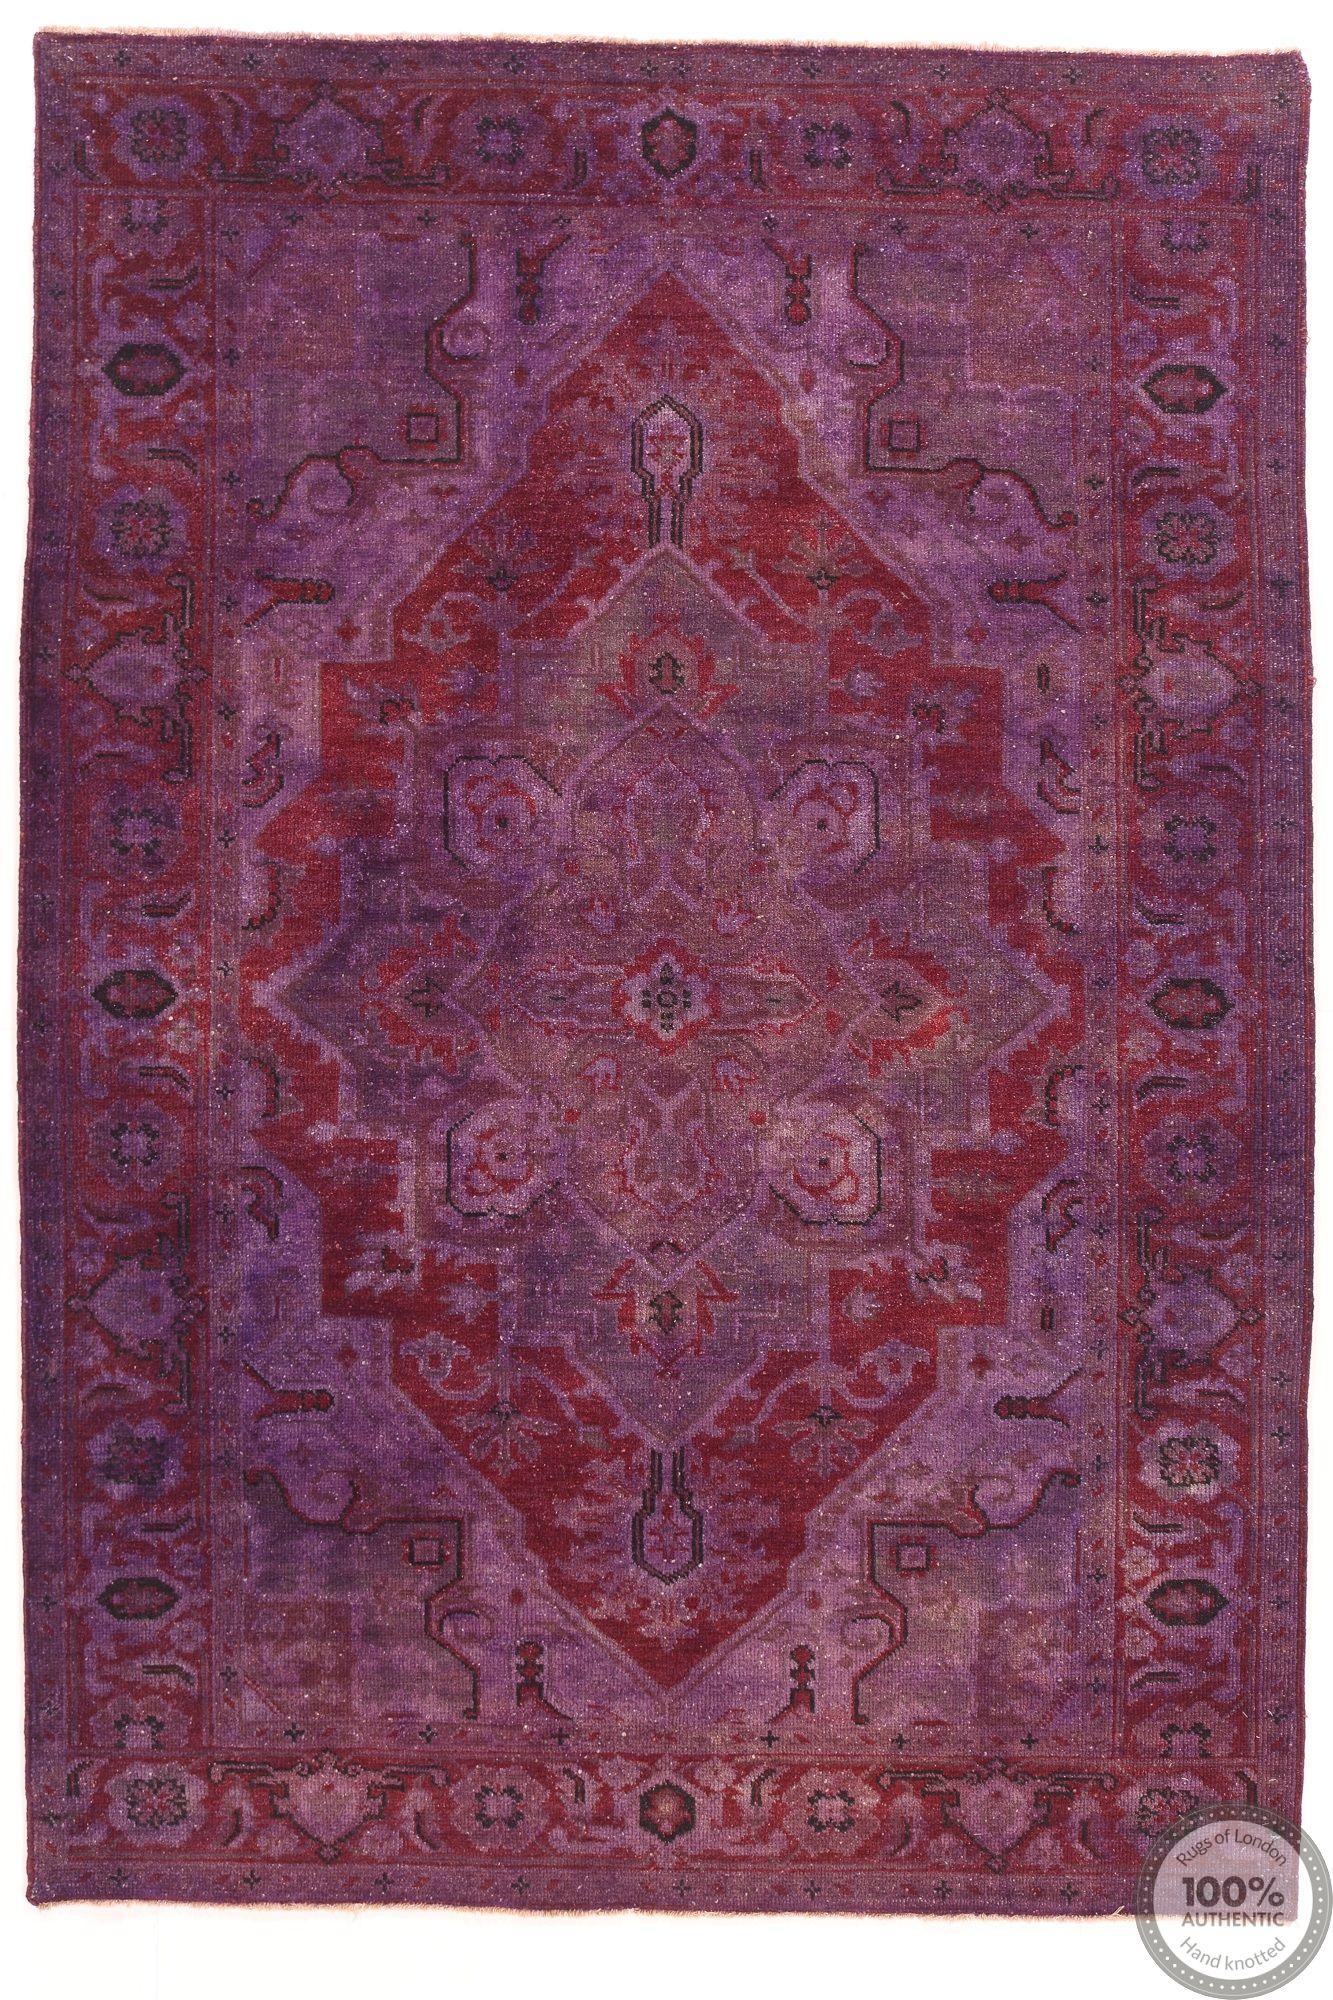 Modern Ocean rug - 7'9 x 5'5